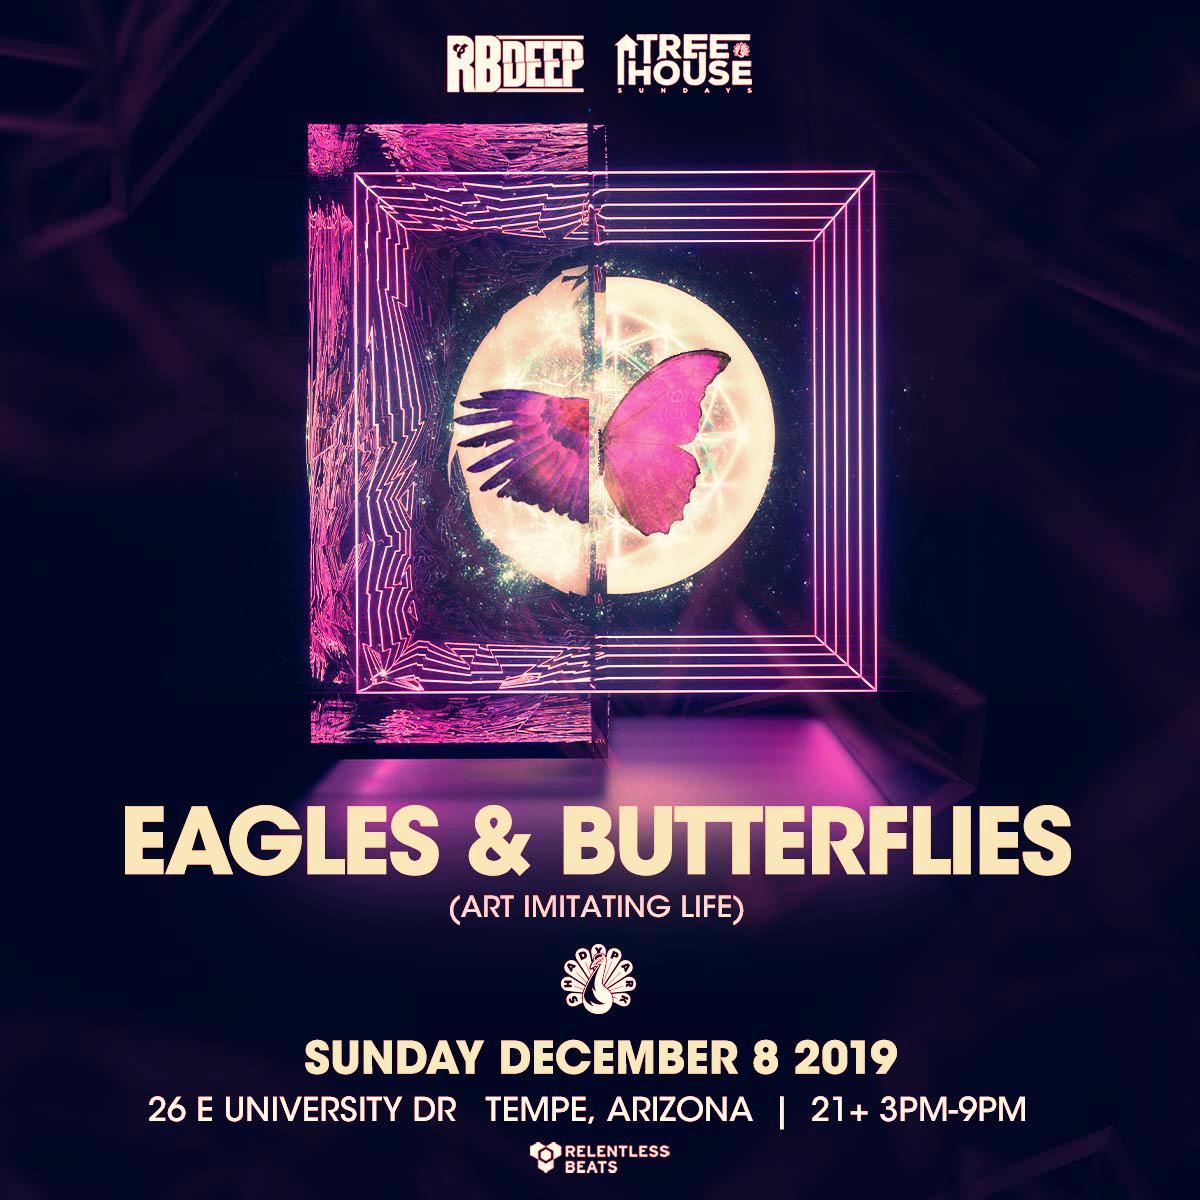 Flyer for Eagles & Butterflies